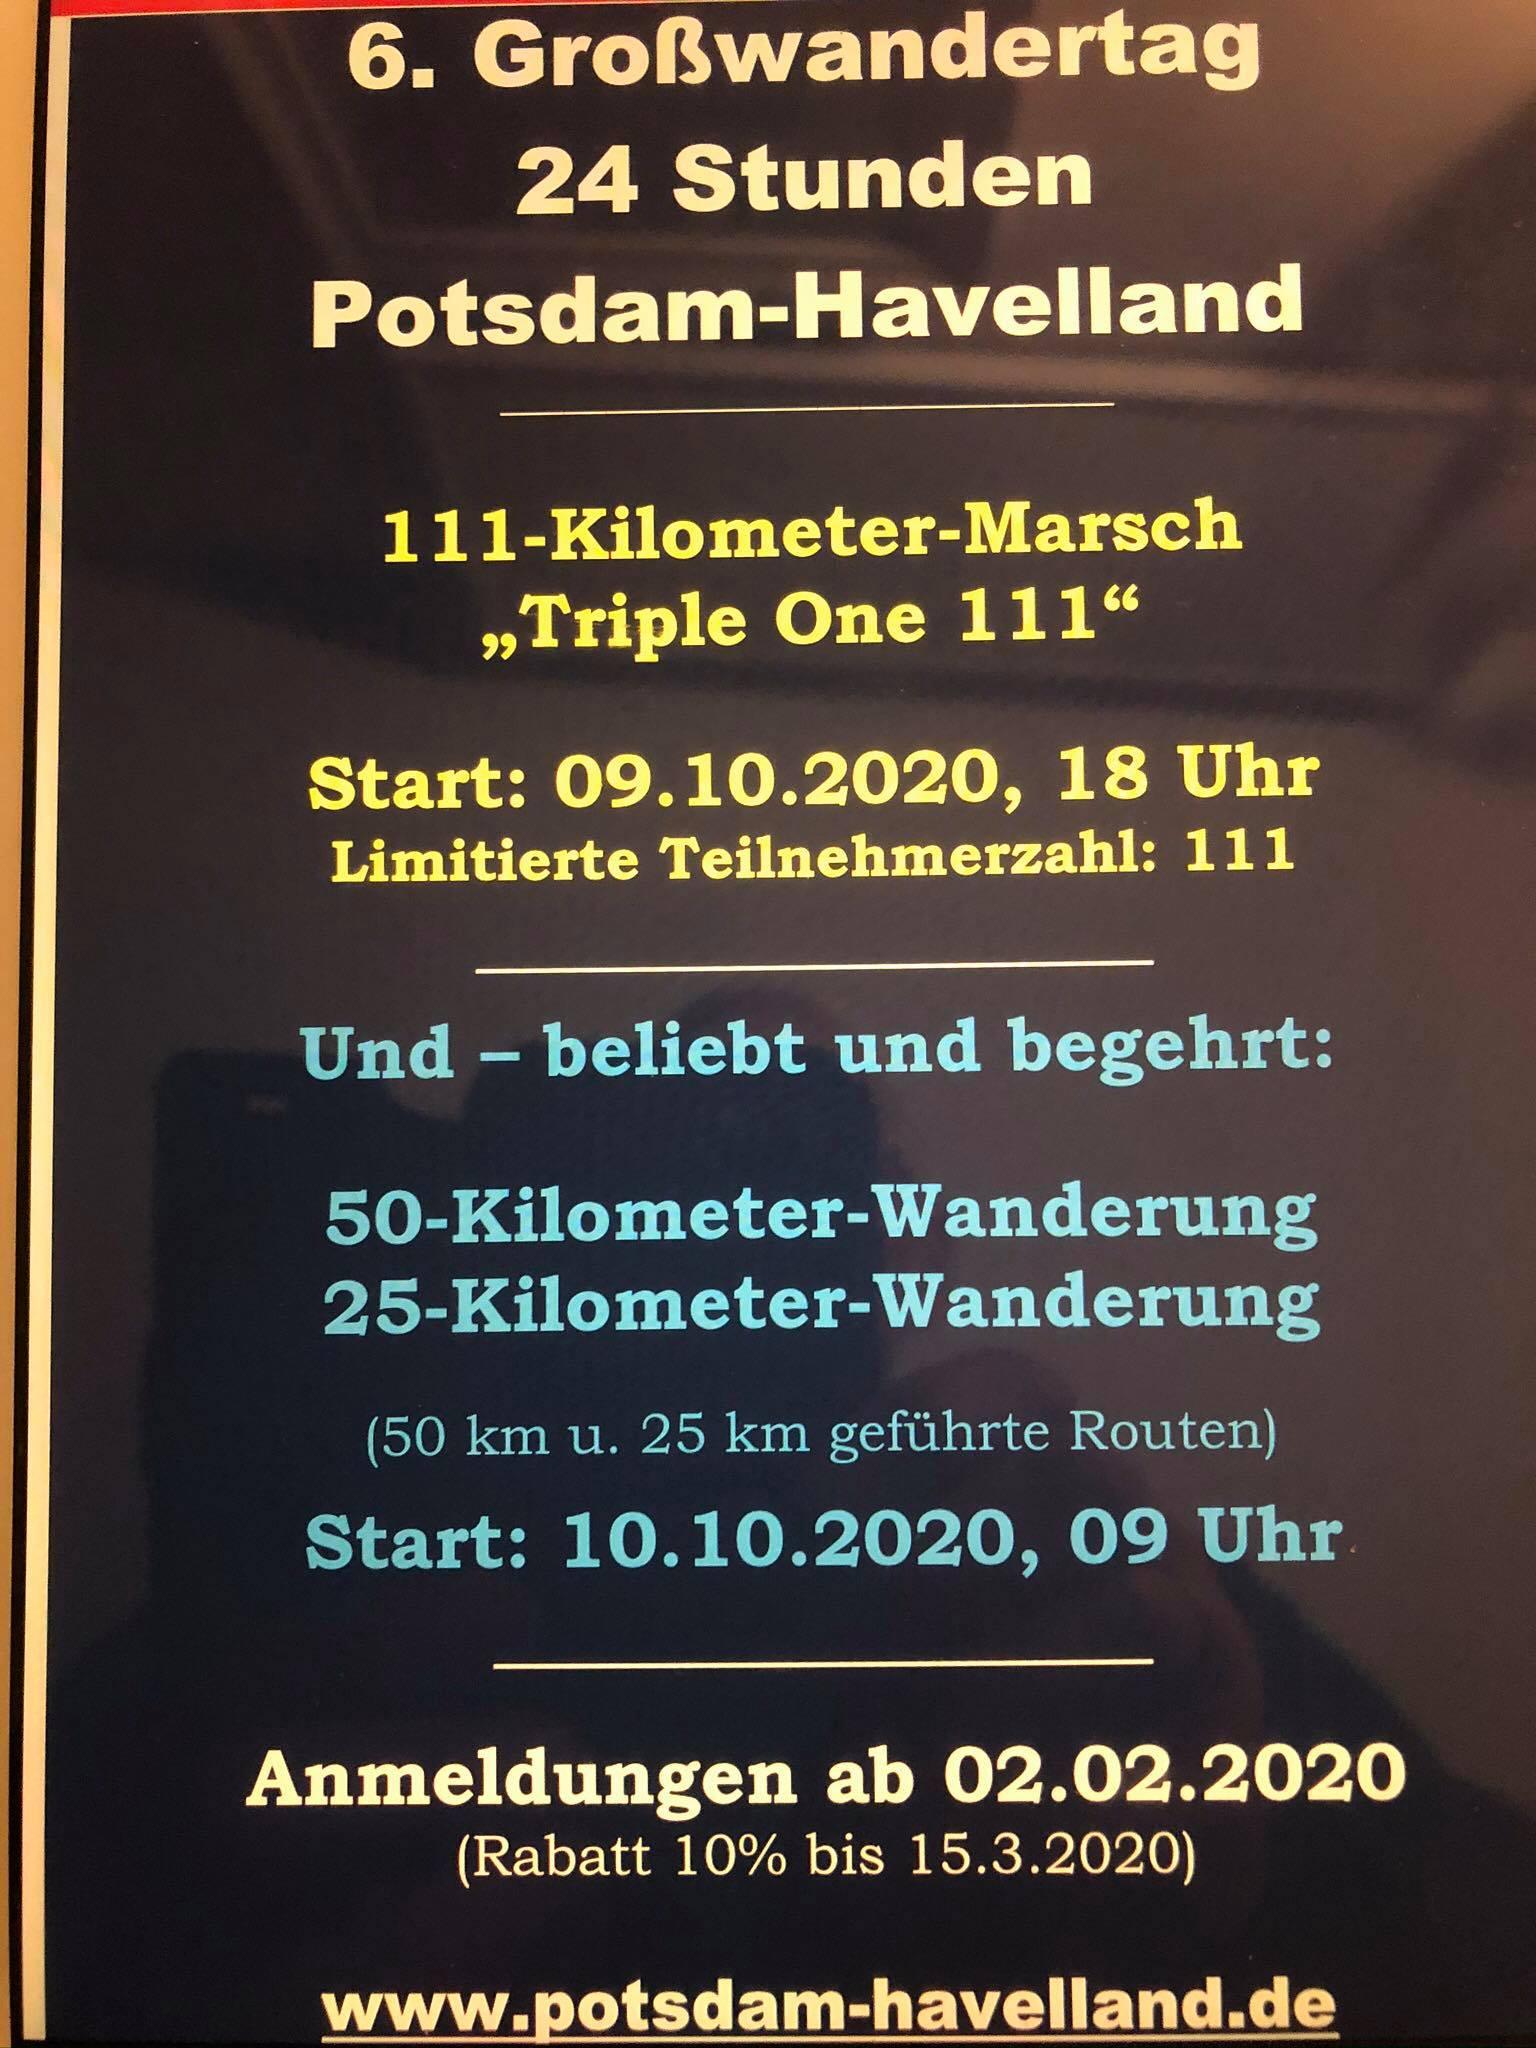 Potsdam - Havelland